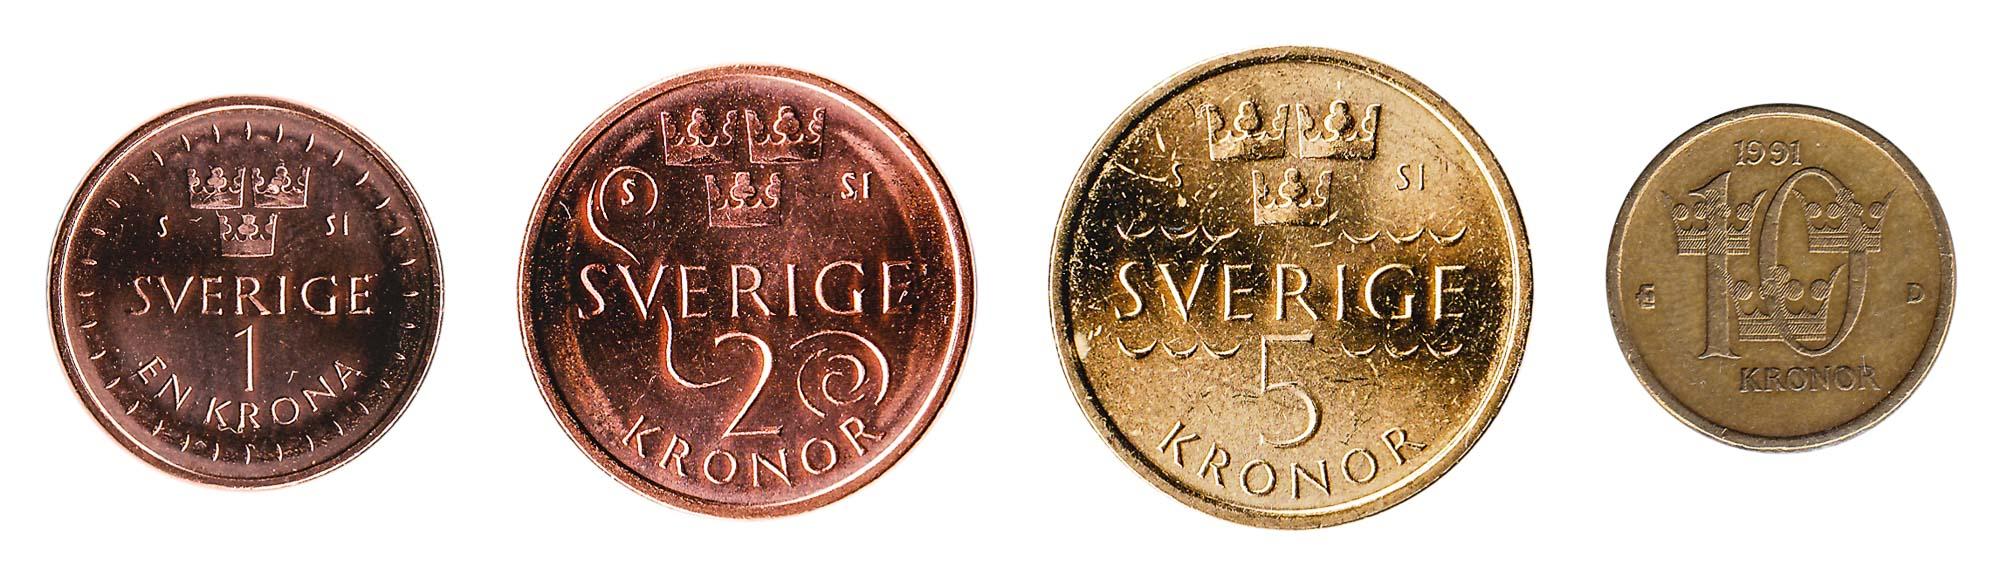 Buy Swedish Krona online – SEK home delivery | ManorFX